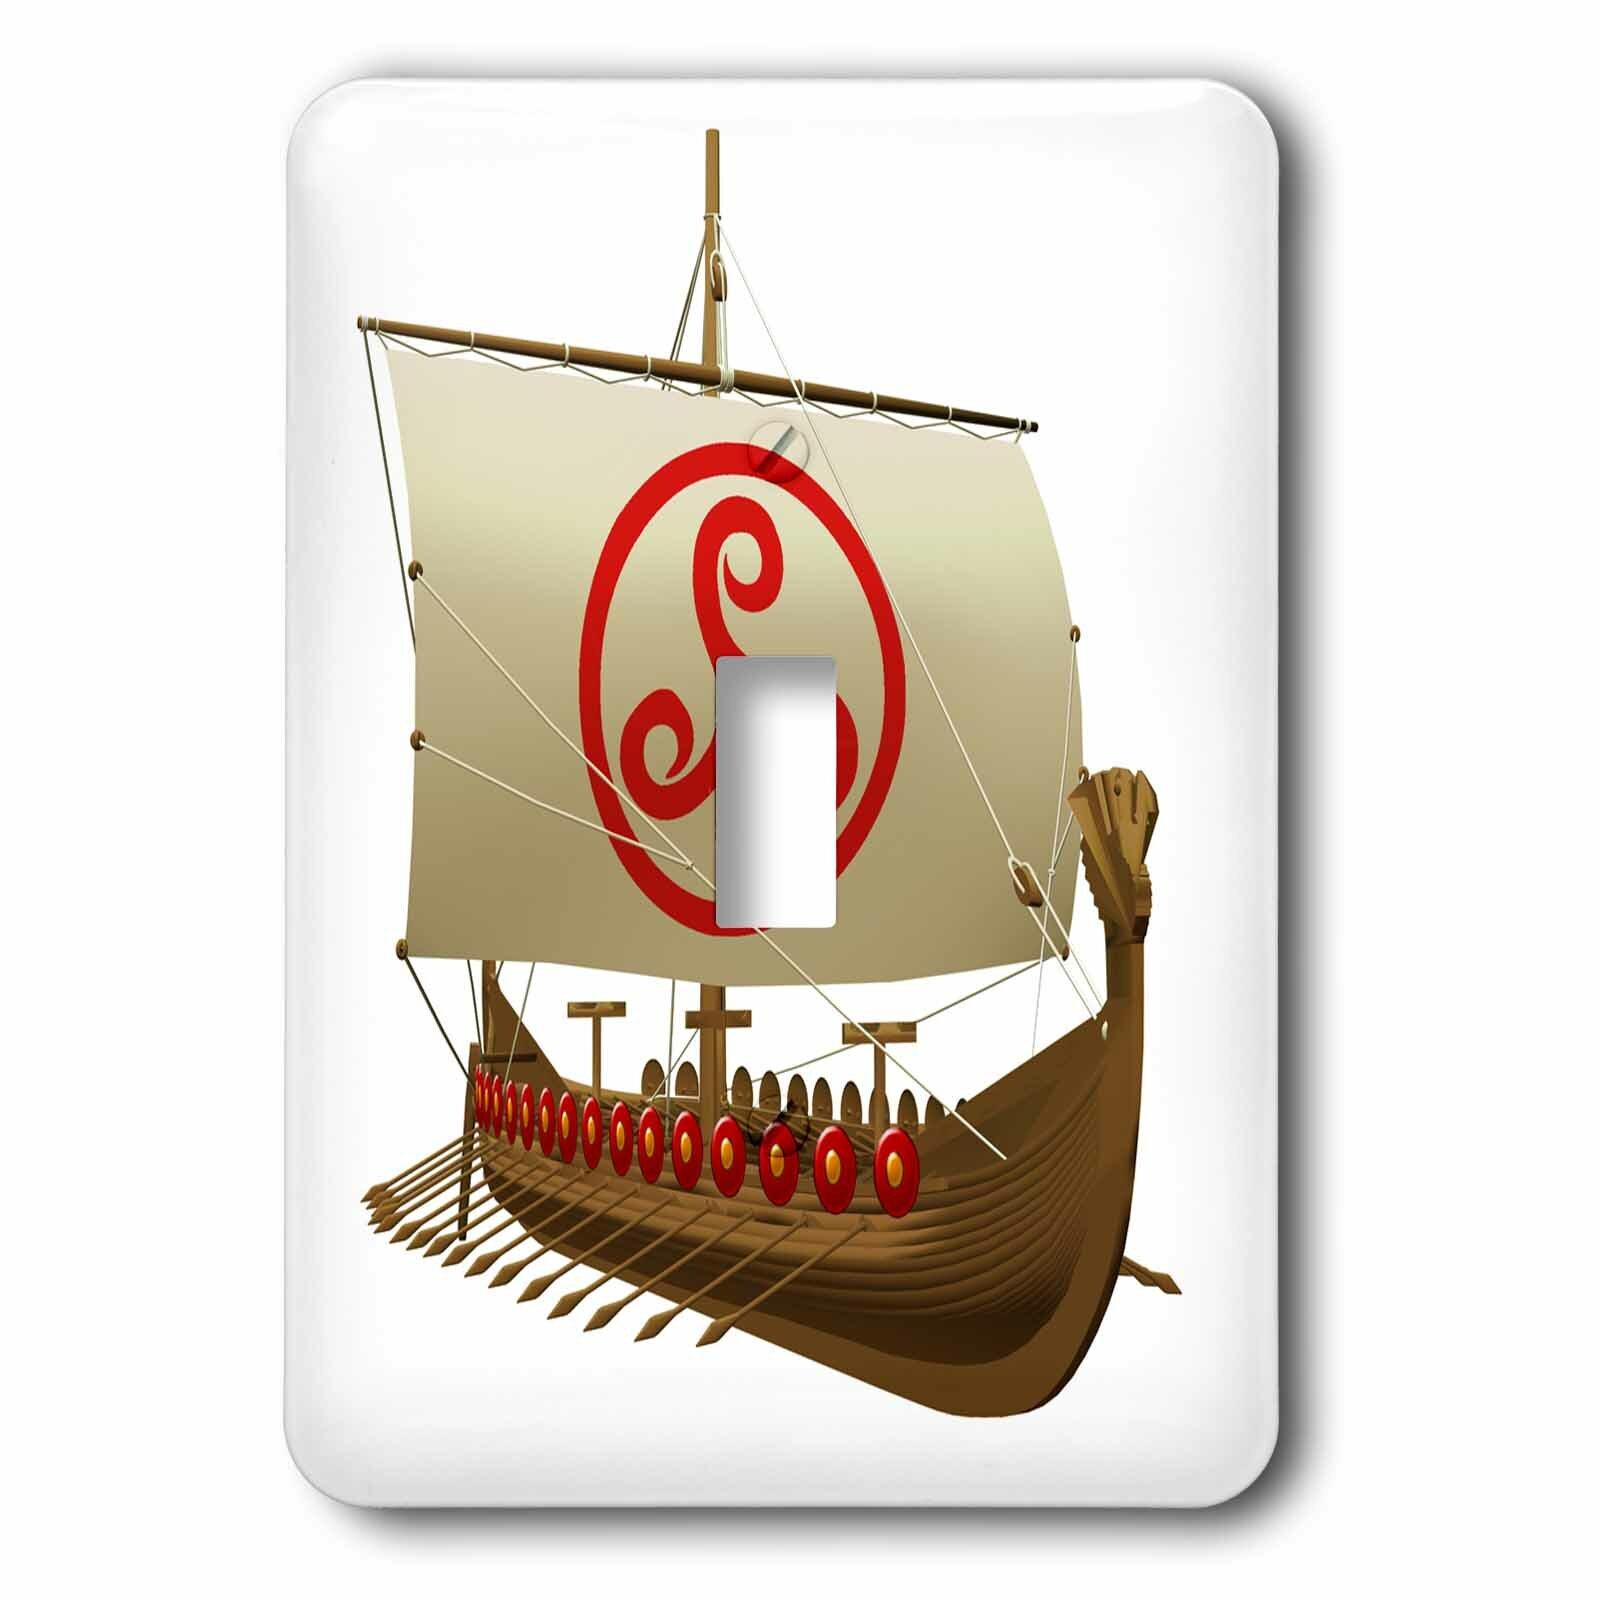 3drose Viking Ship With Sail 1 Gang Toggle Light Switch Wall Plate Wayfair Ca